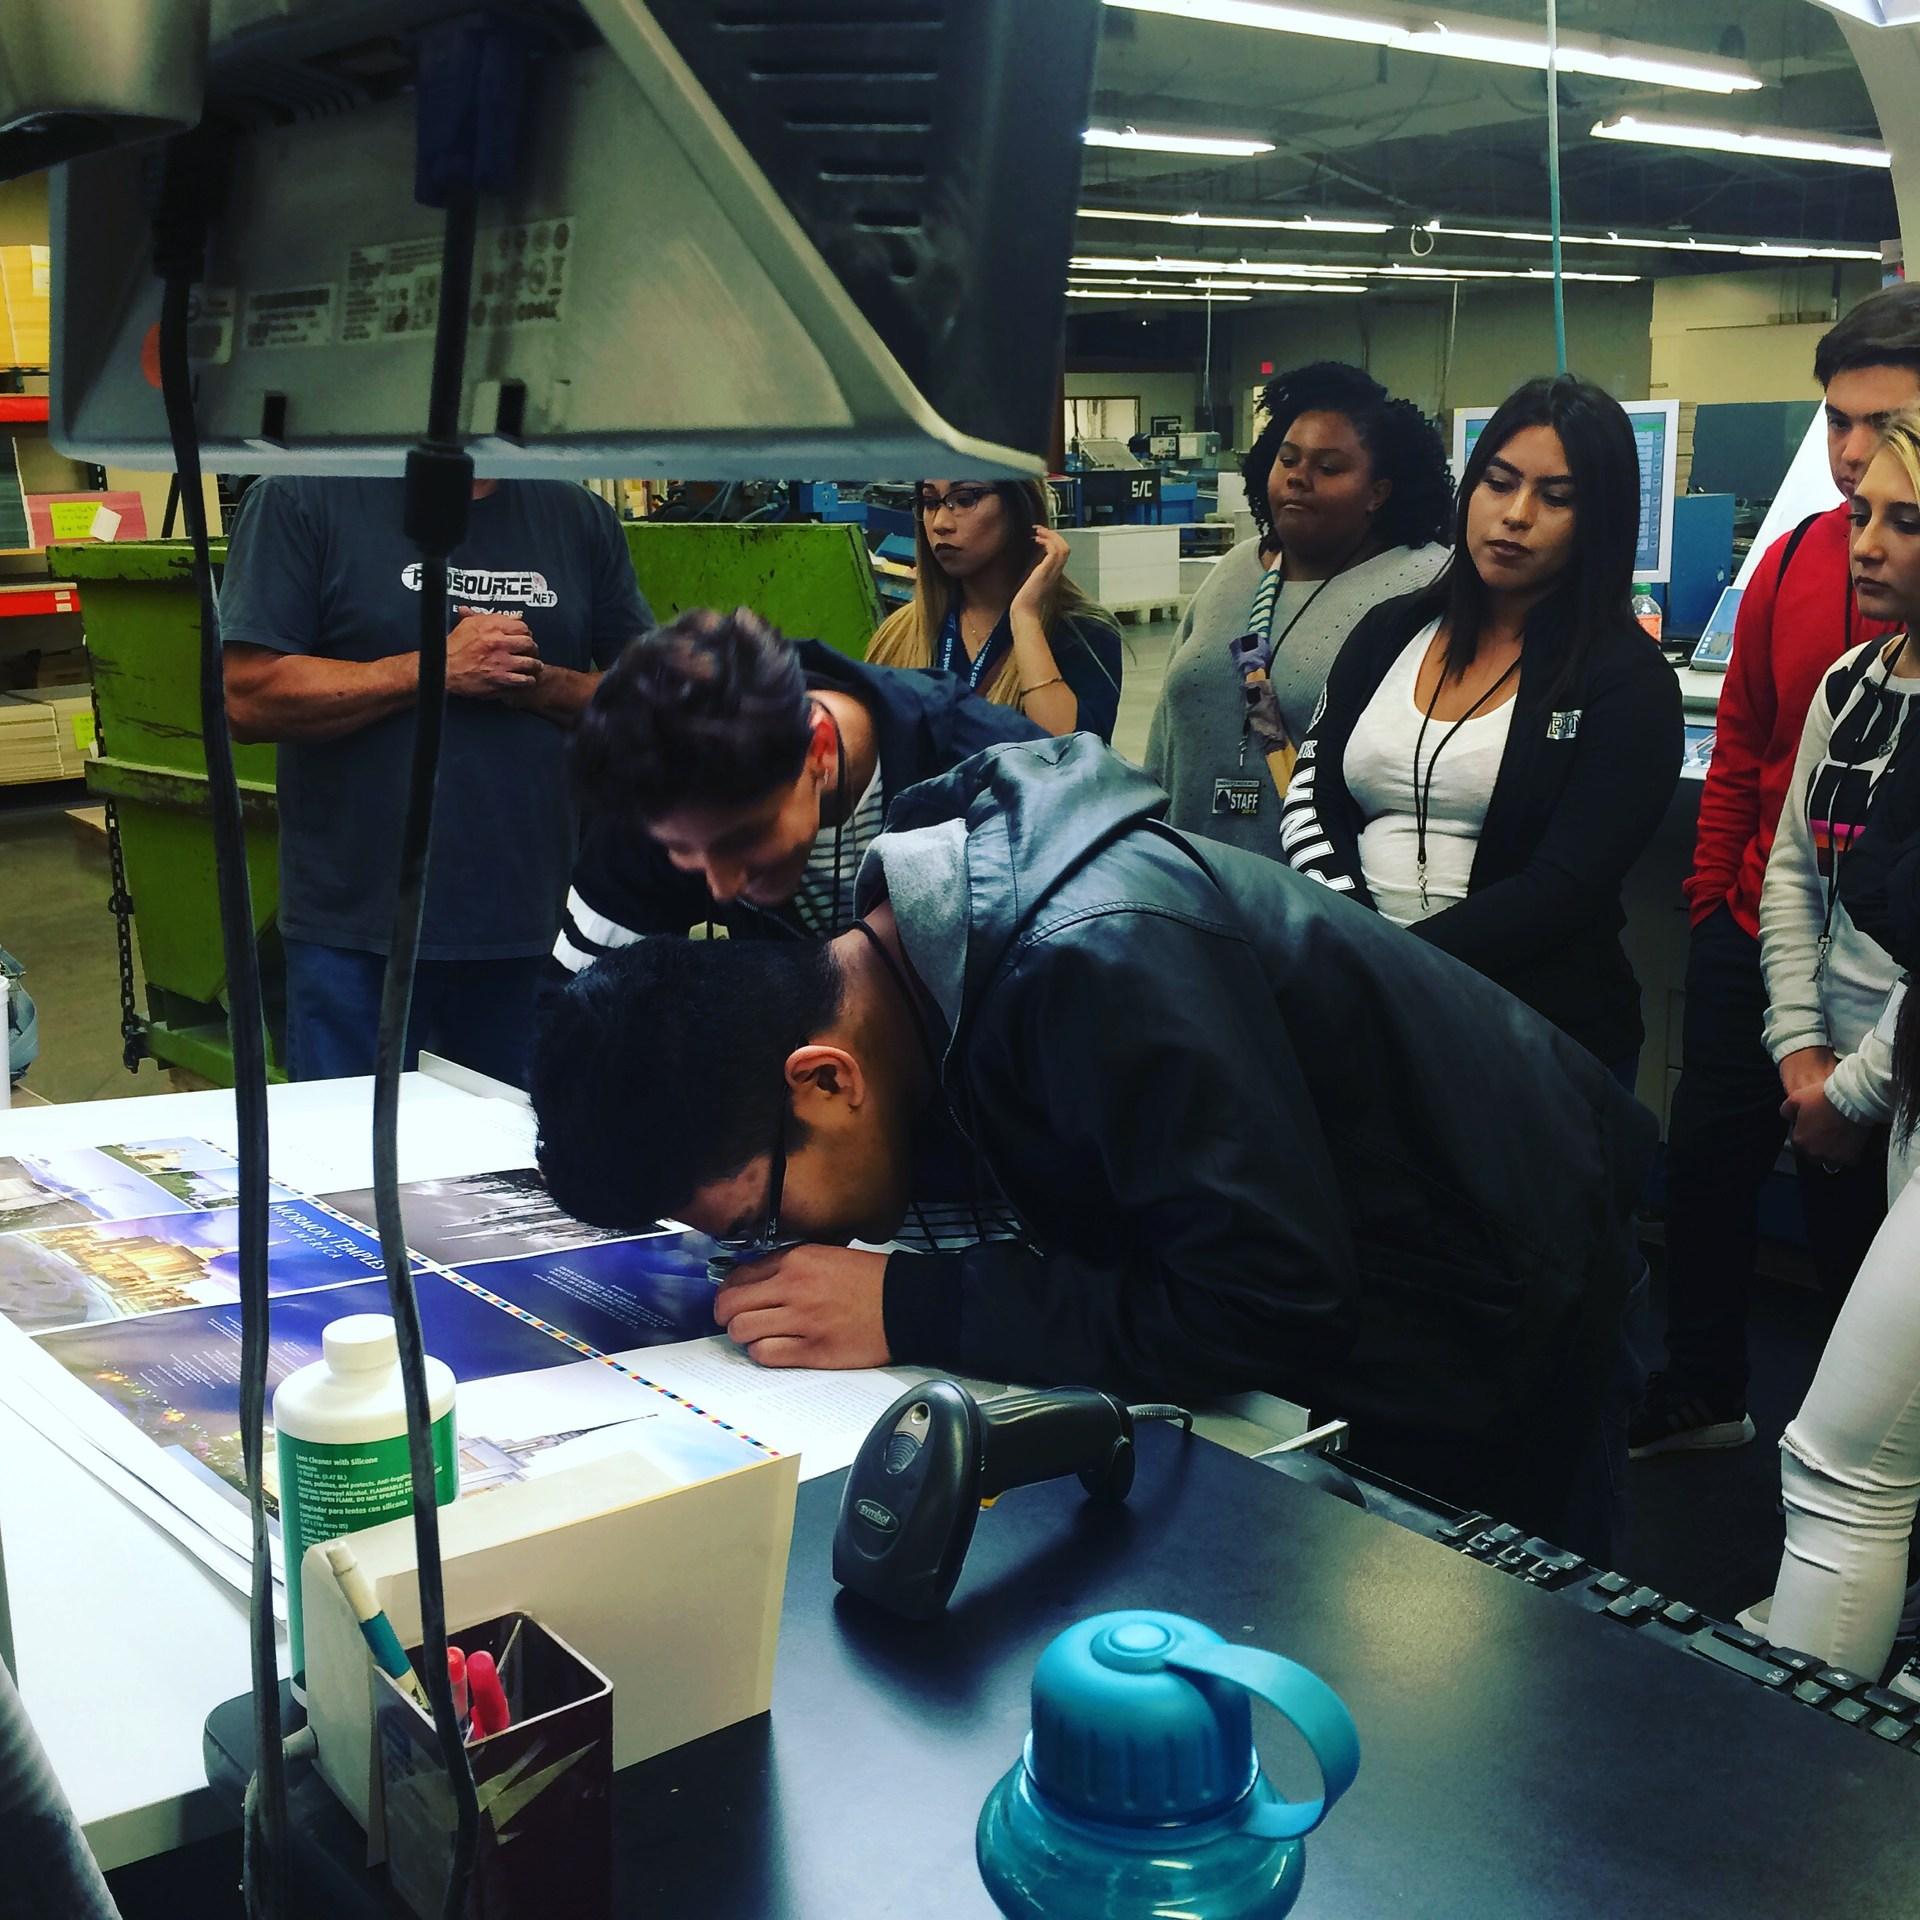 Media students looking at printing proofs at Jostens factory.